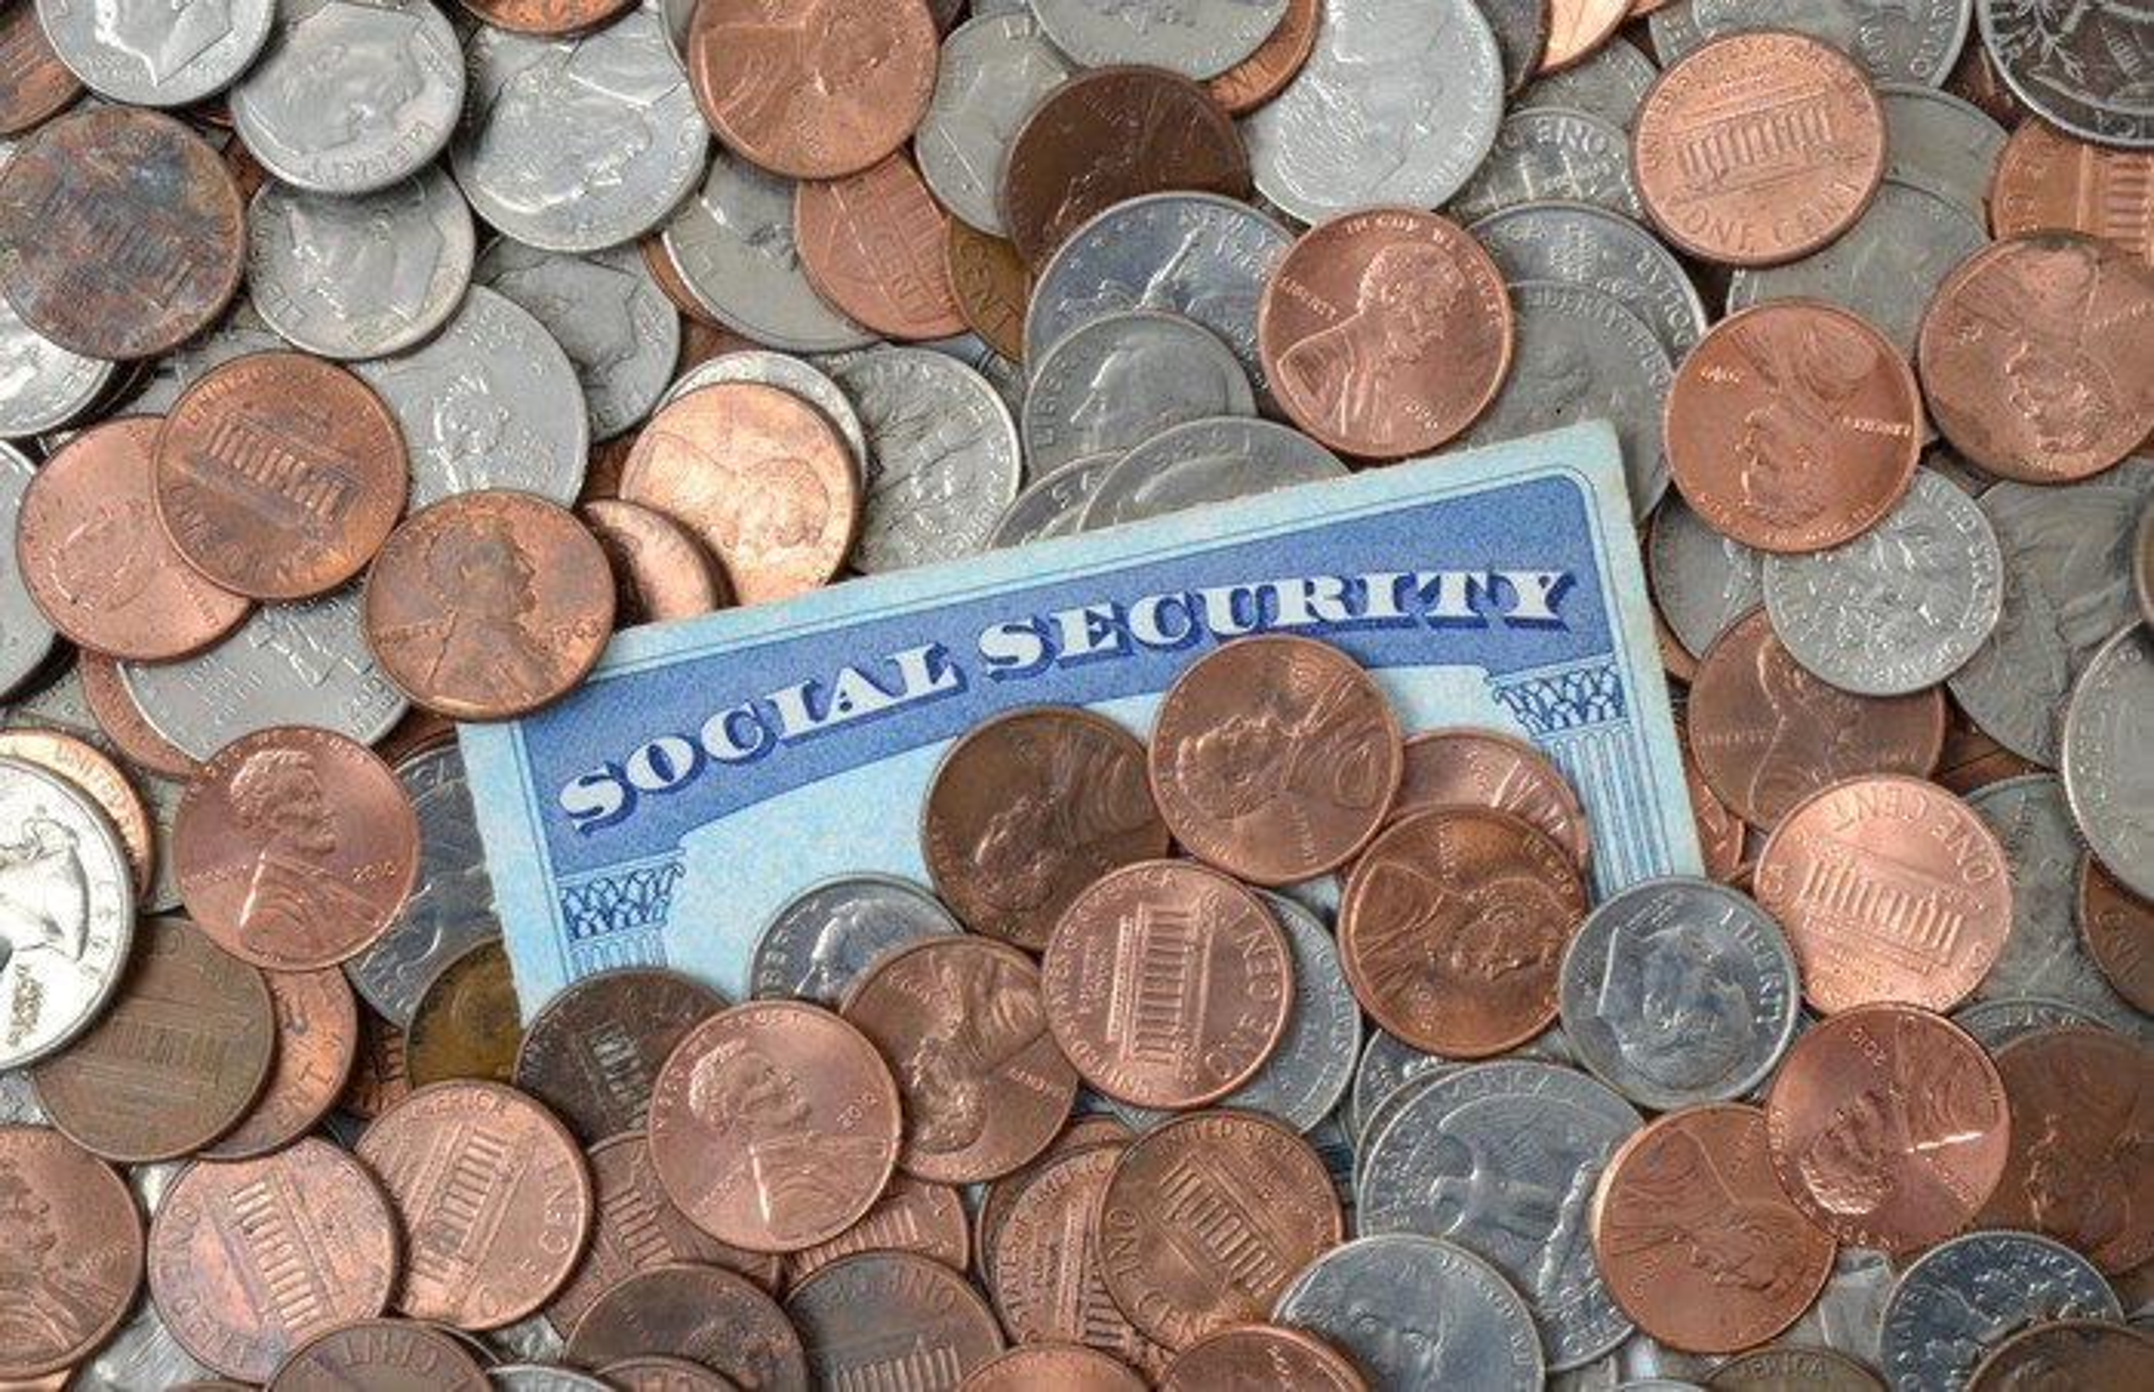 Coins with a Social Security card.